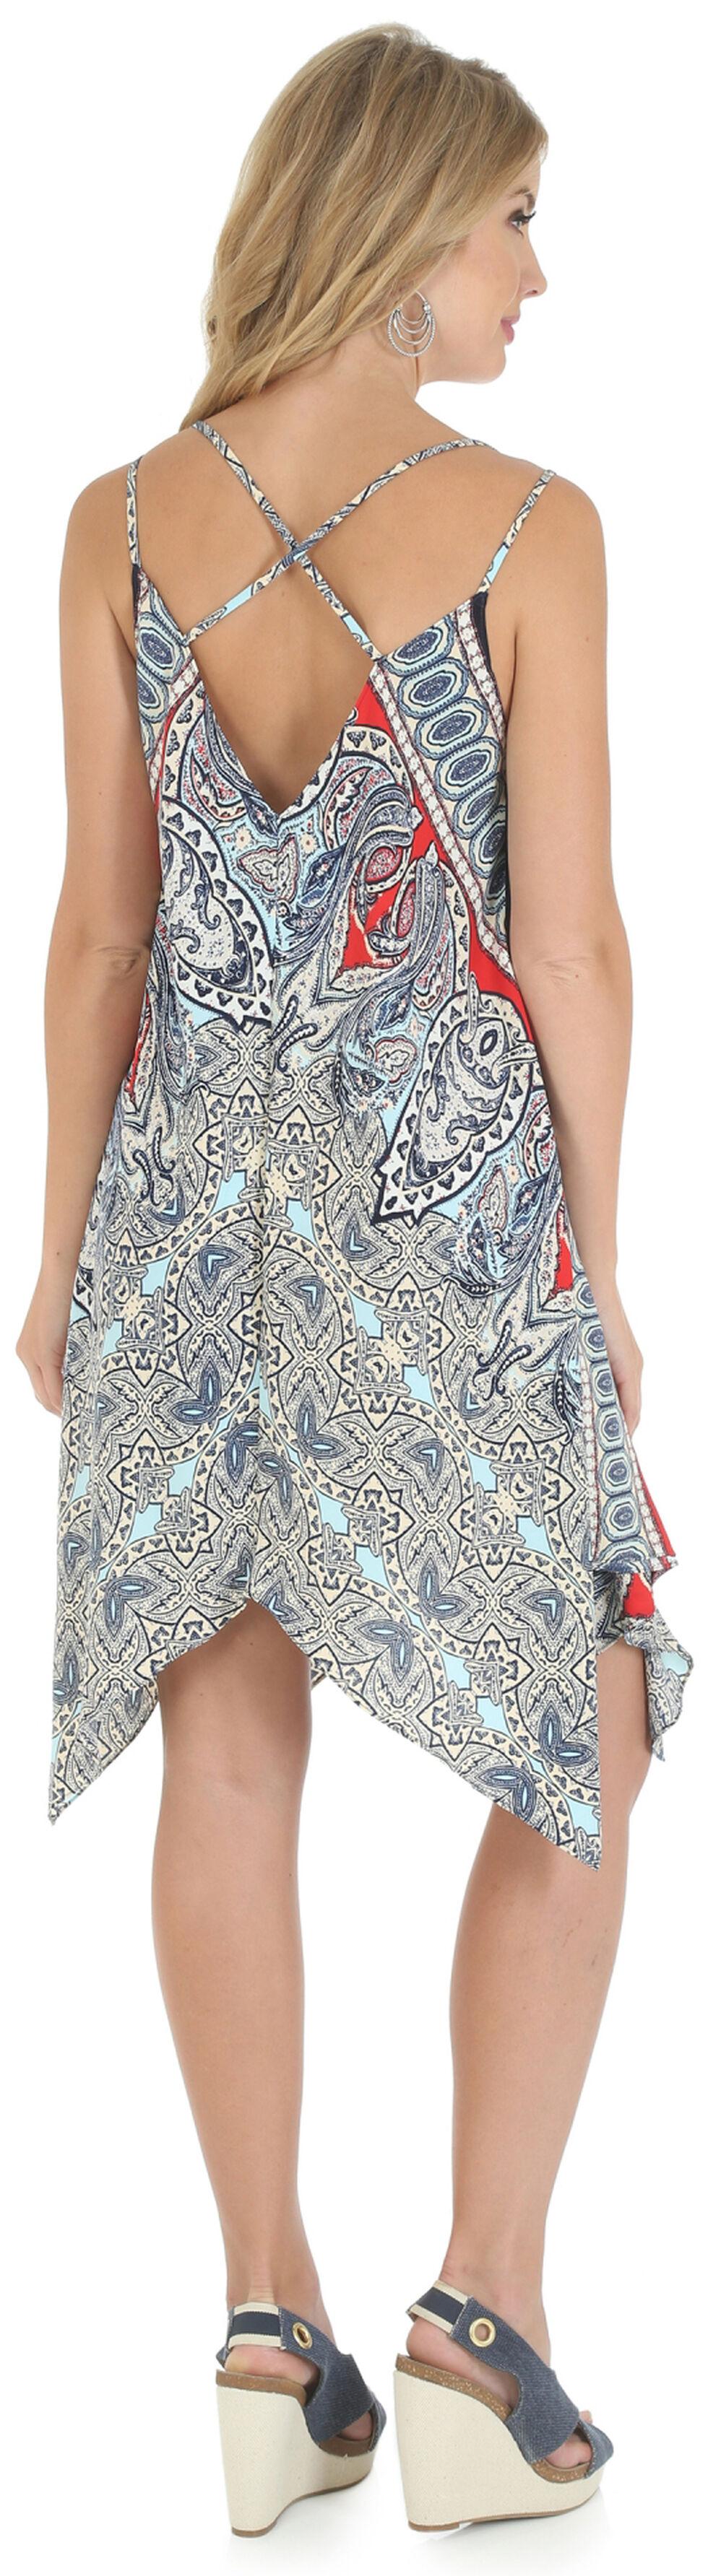 Wrangler Women's Strappy Handkerchief Draped Dress, Blue, hi-res